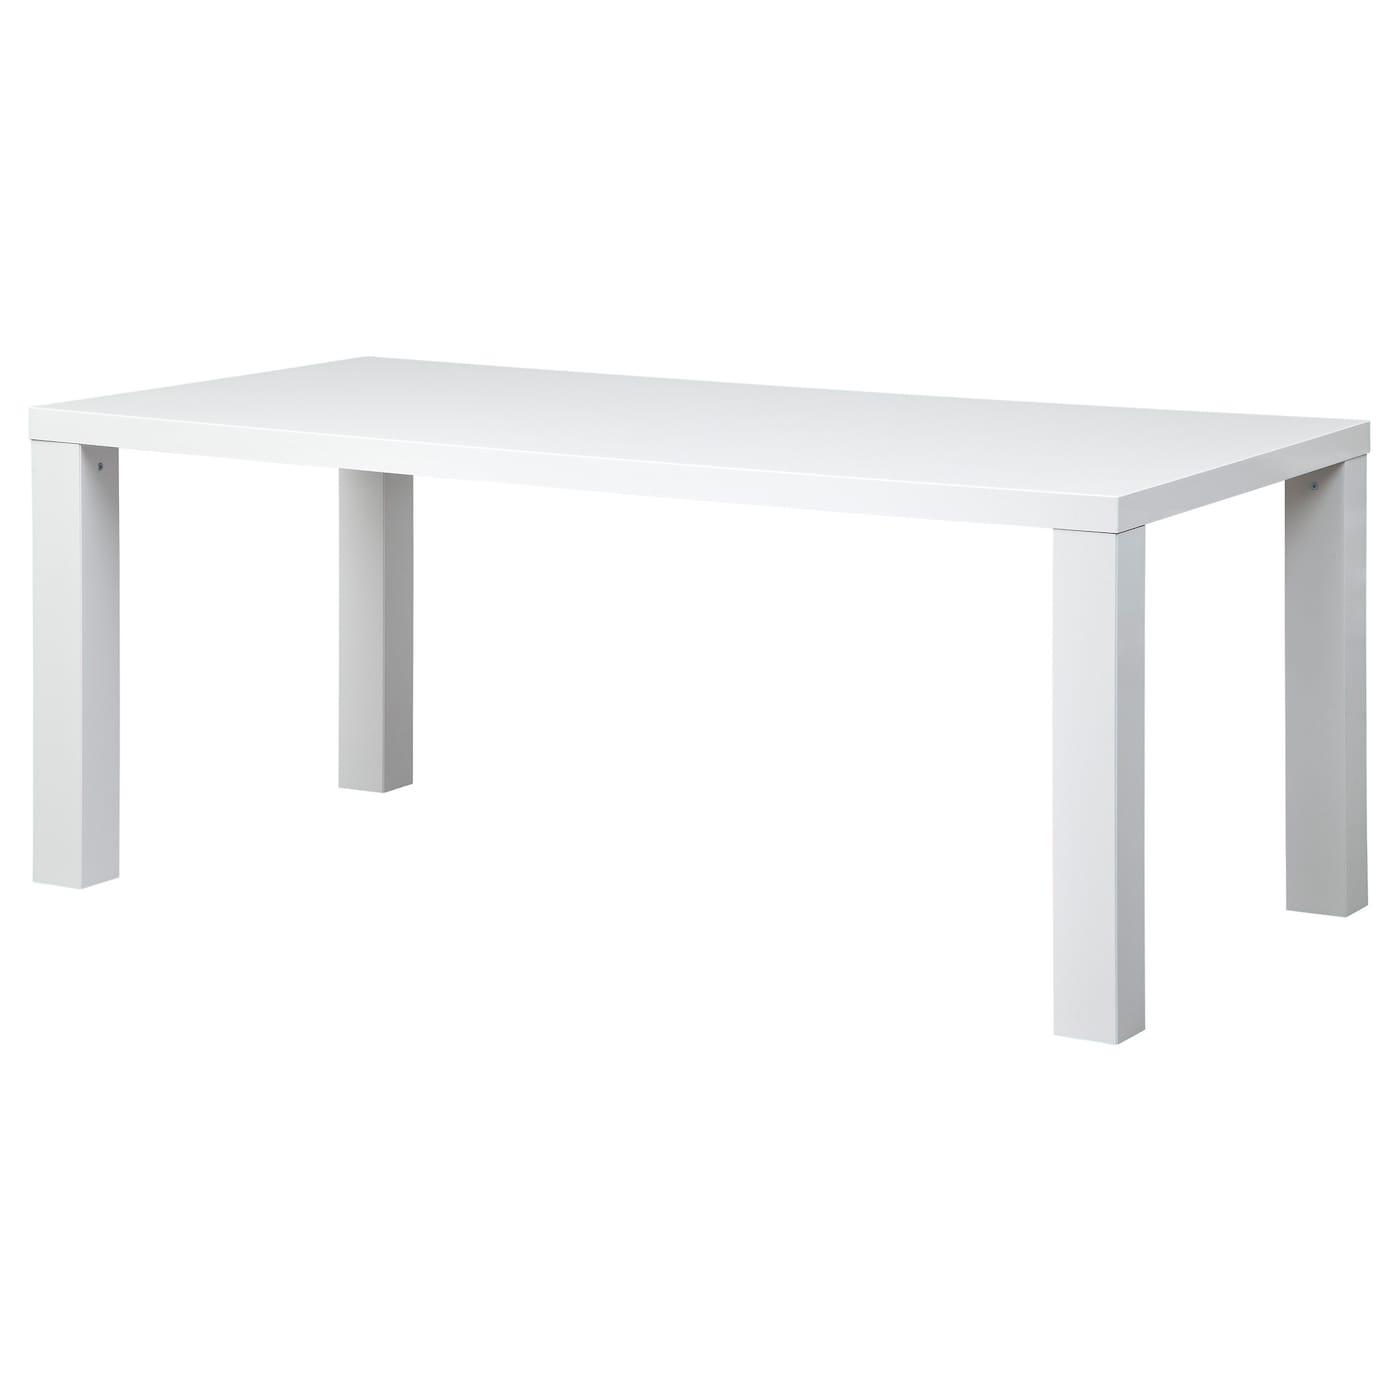 toresund table blanc brillant 180x90 cm ikea. Black Bedroom Furniture Sets. Home Design Ideas